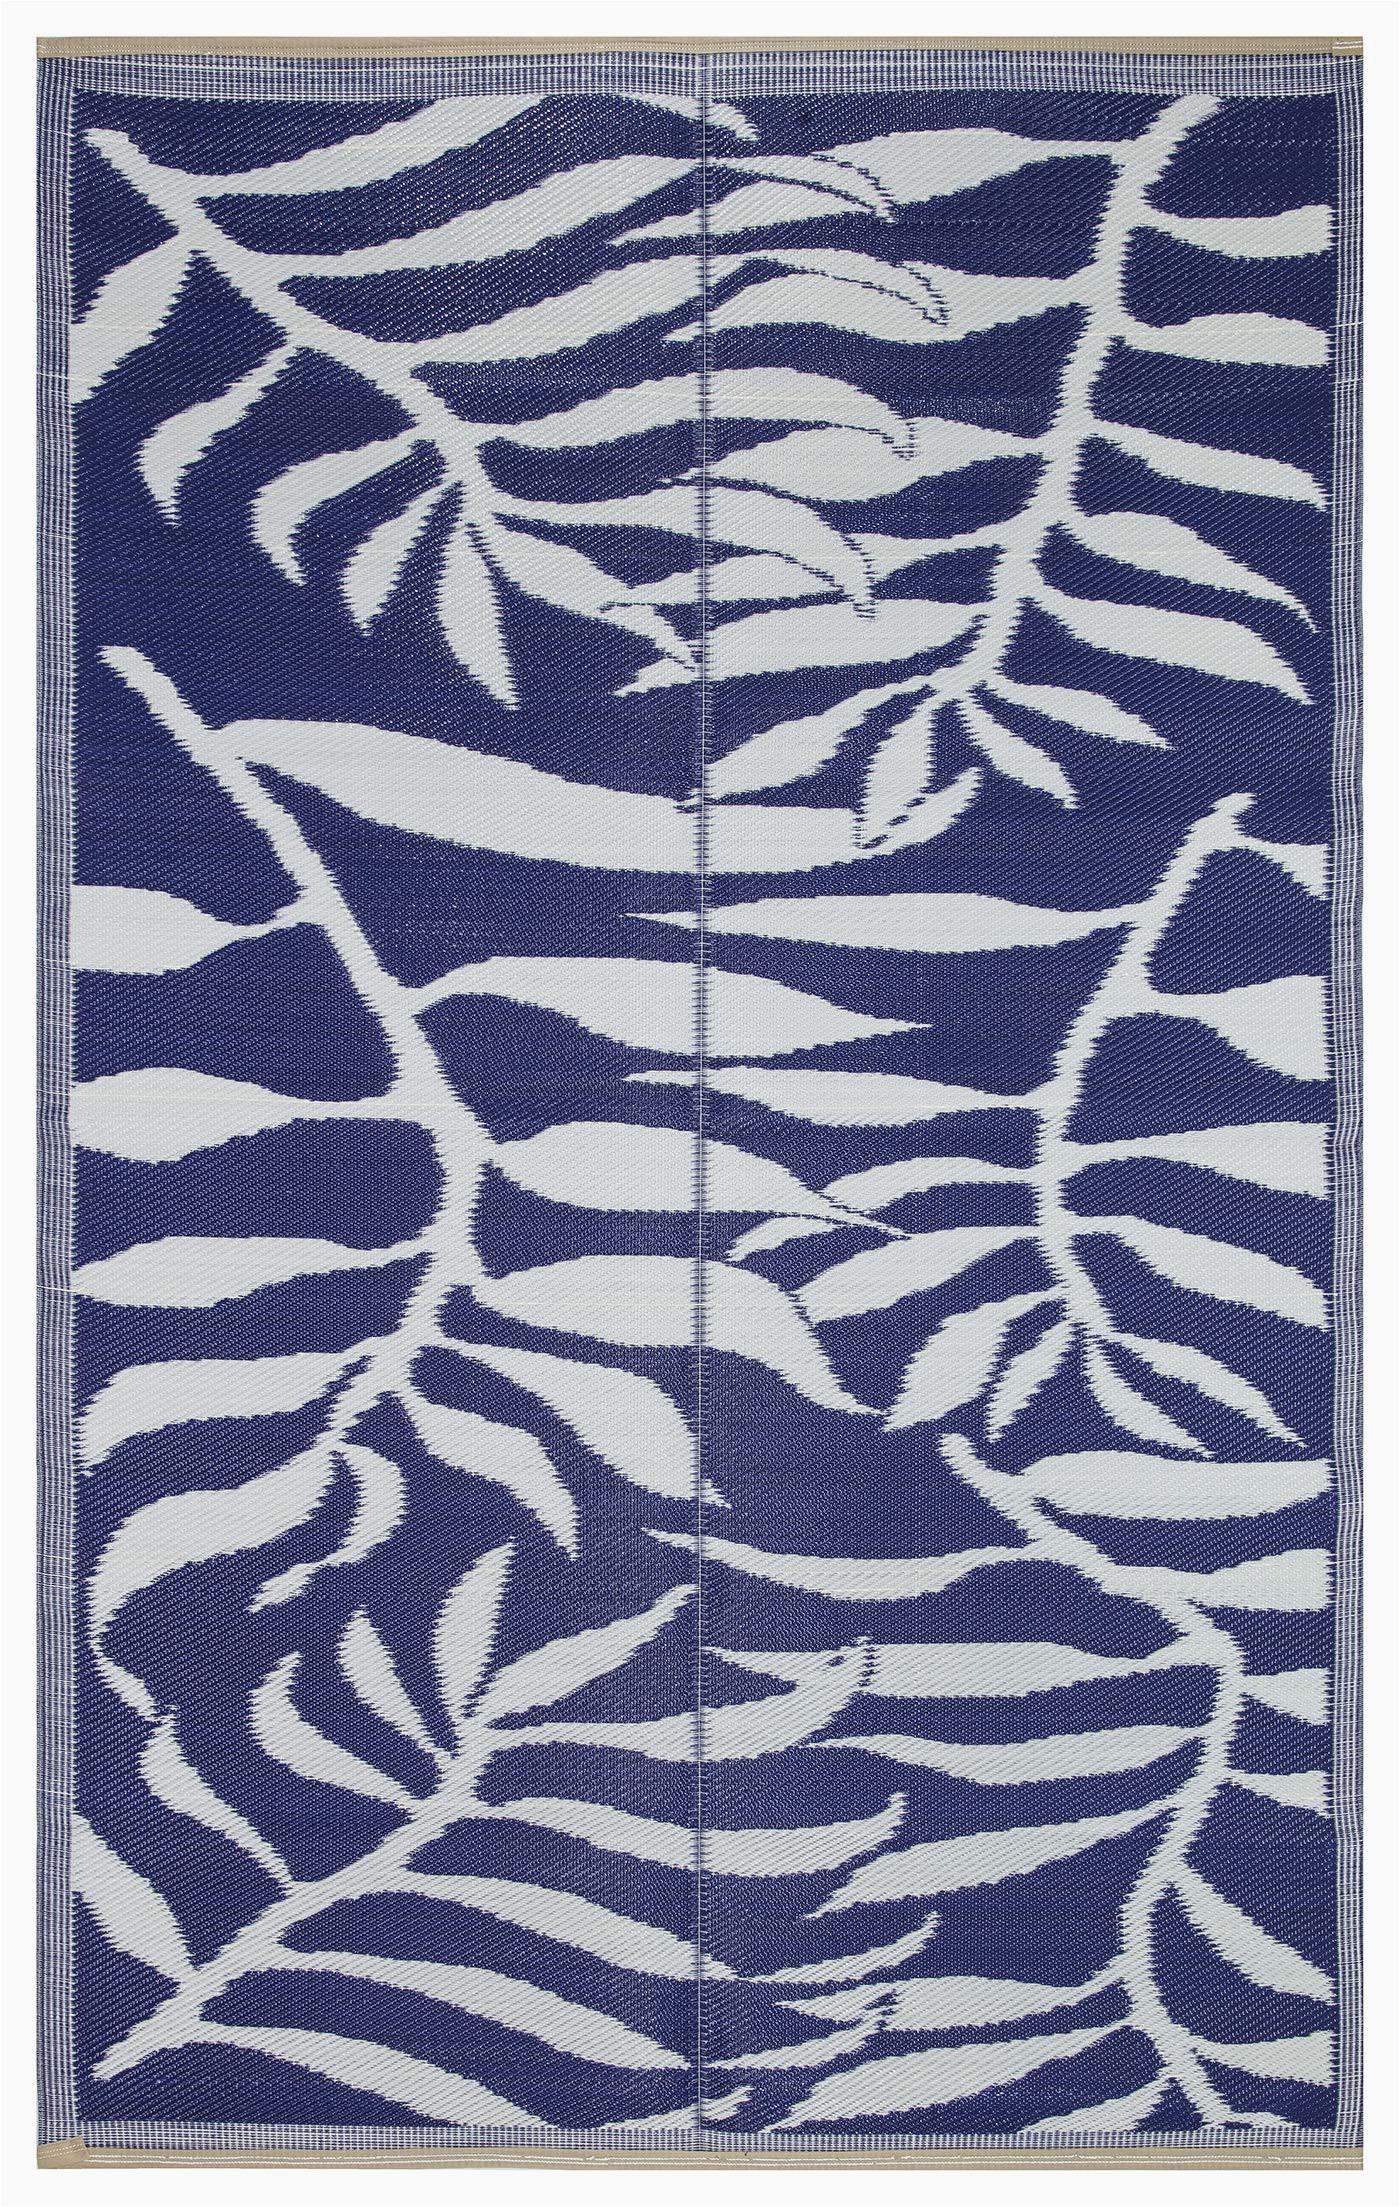 lightweight indoor outdoor reversible plastic area rug 5 9 x 8 9 feet leaf pattern blue white